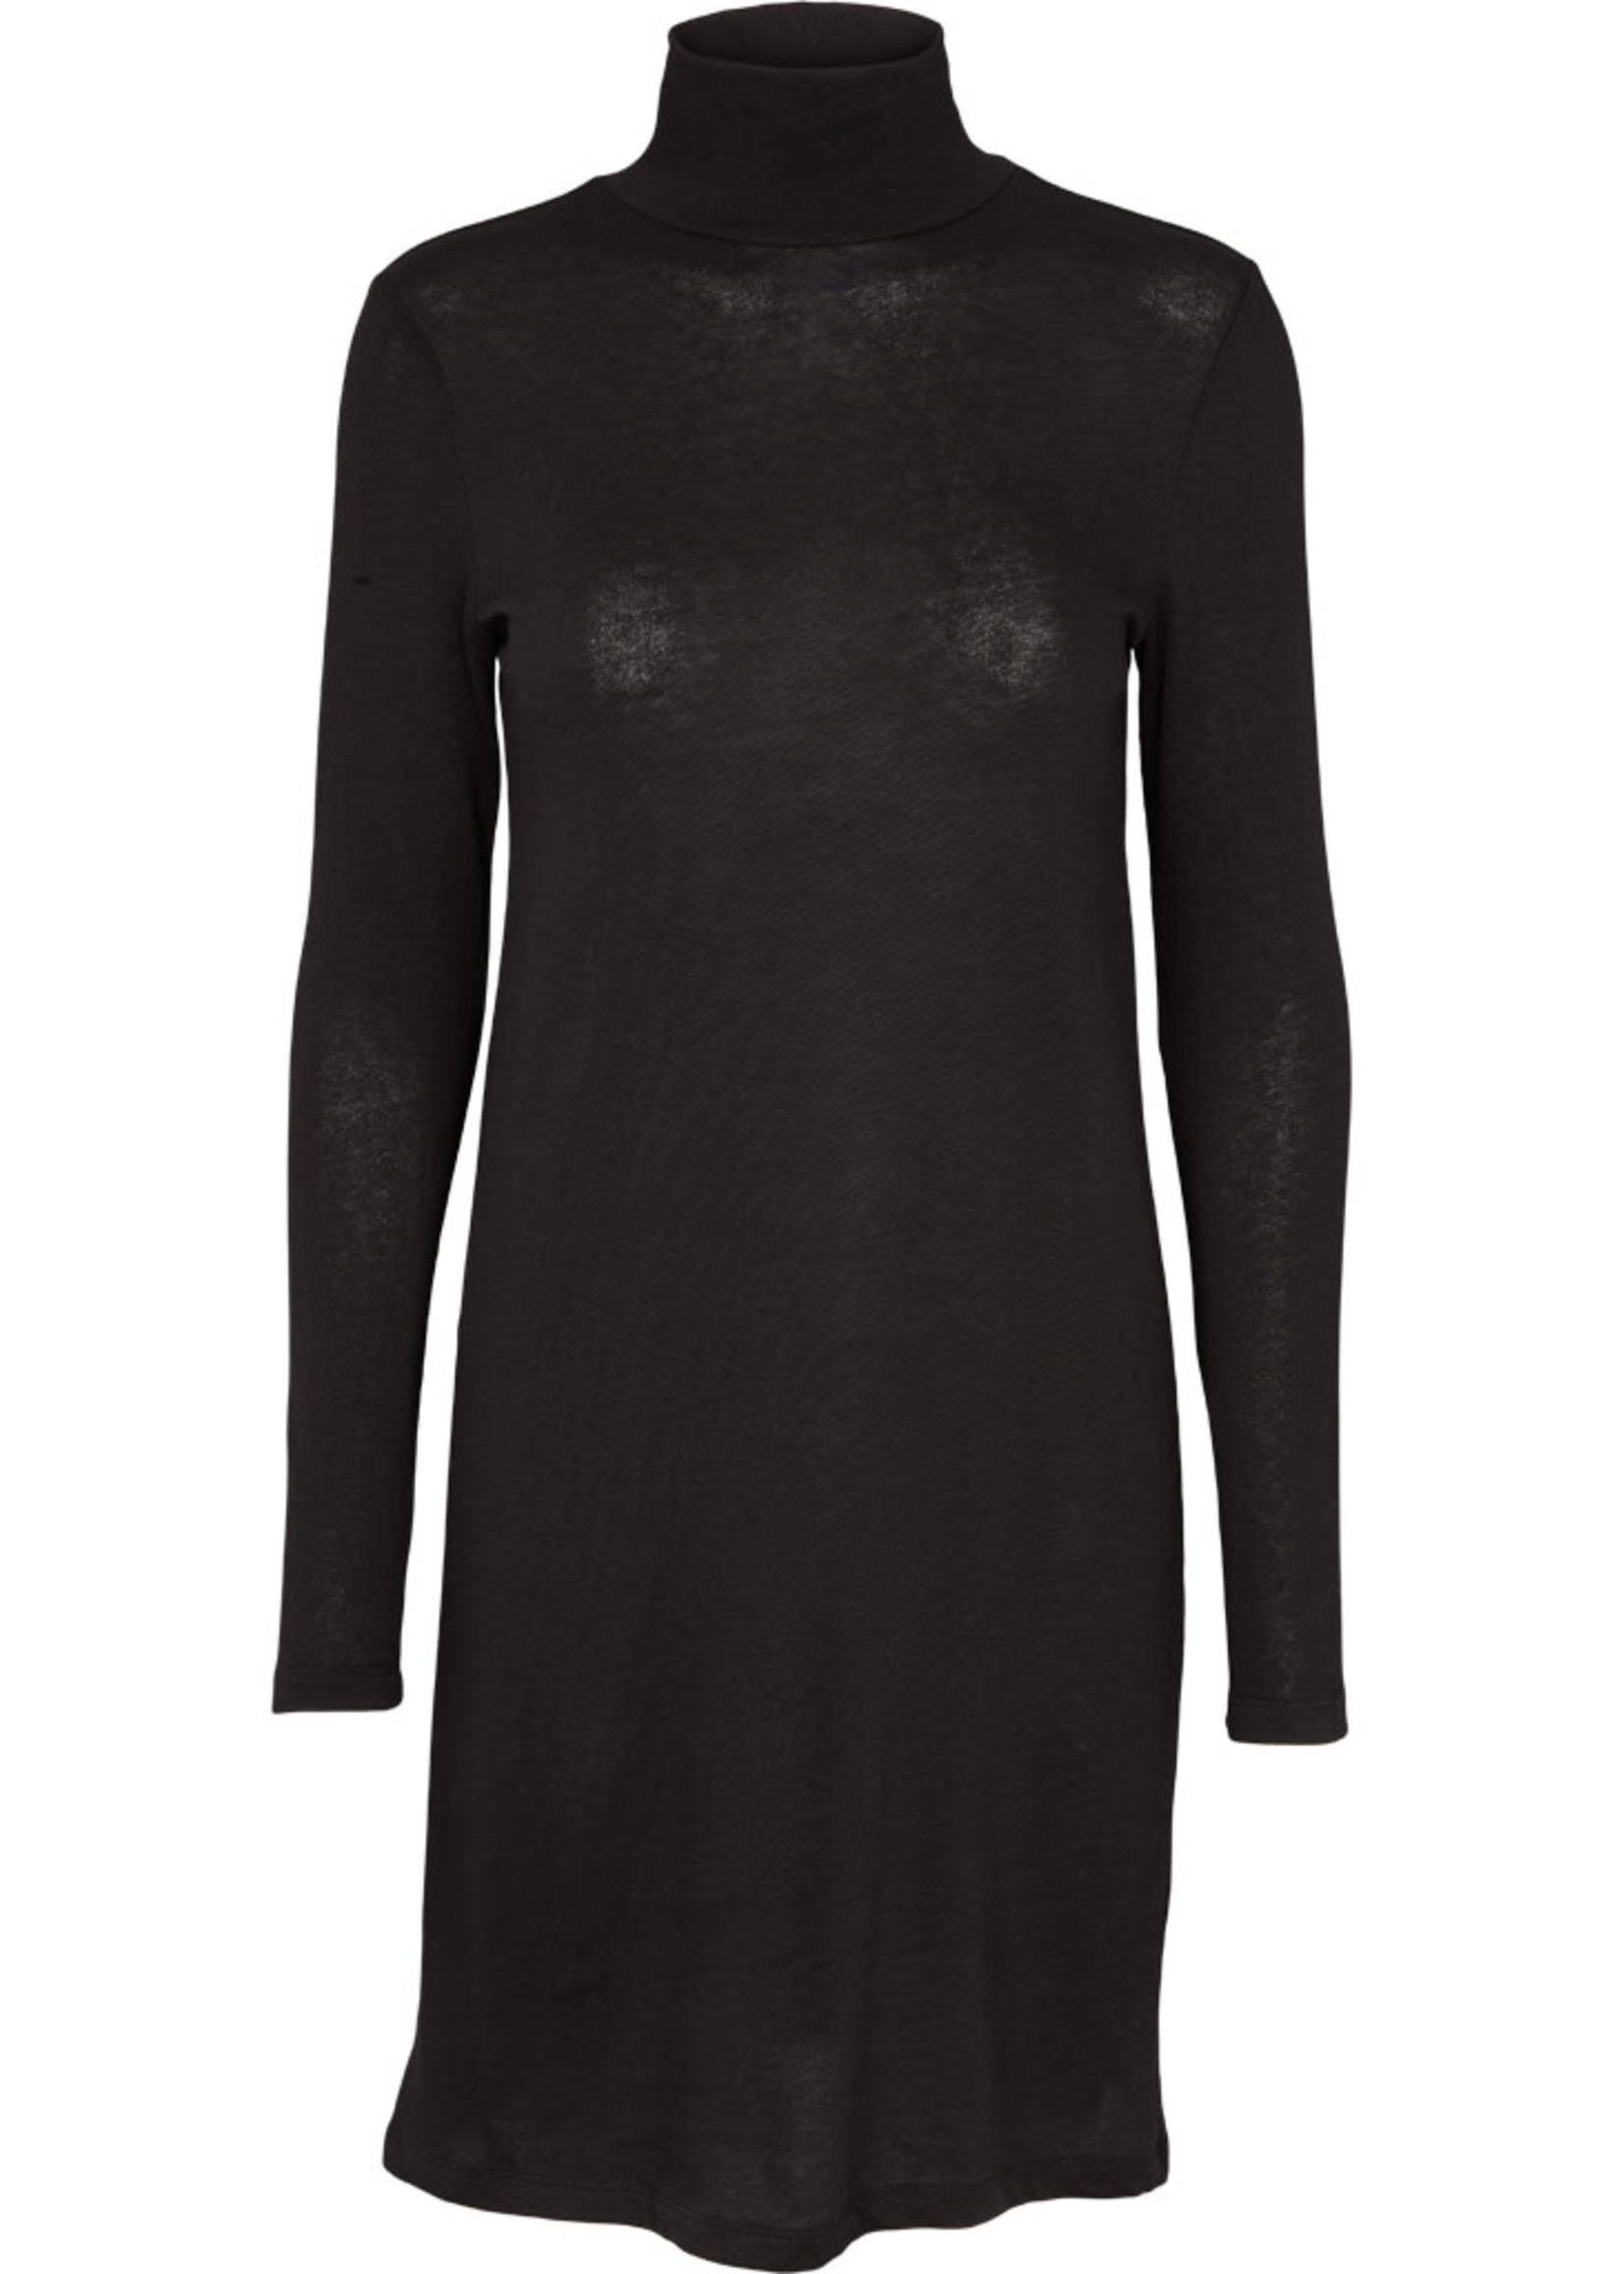 Basic Apparel Arina Dress